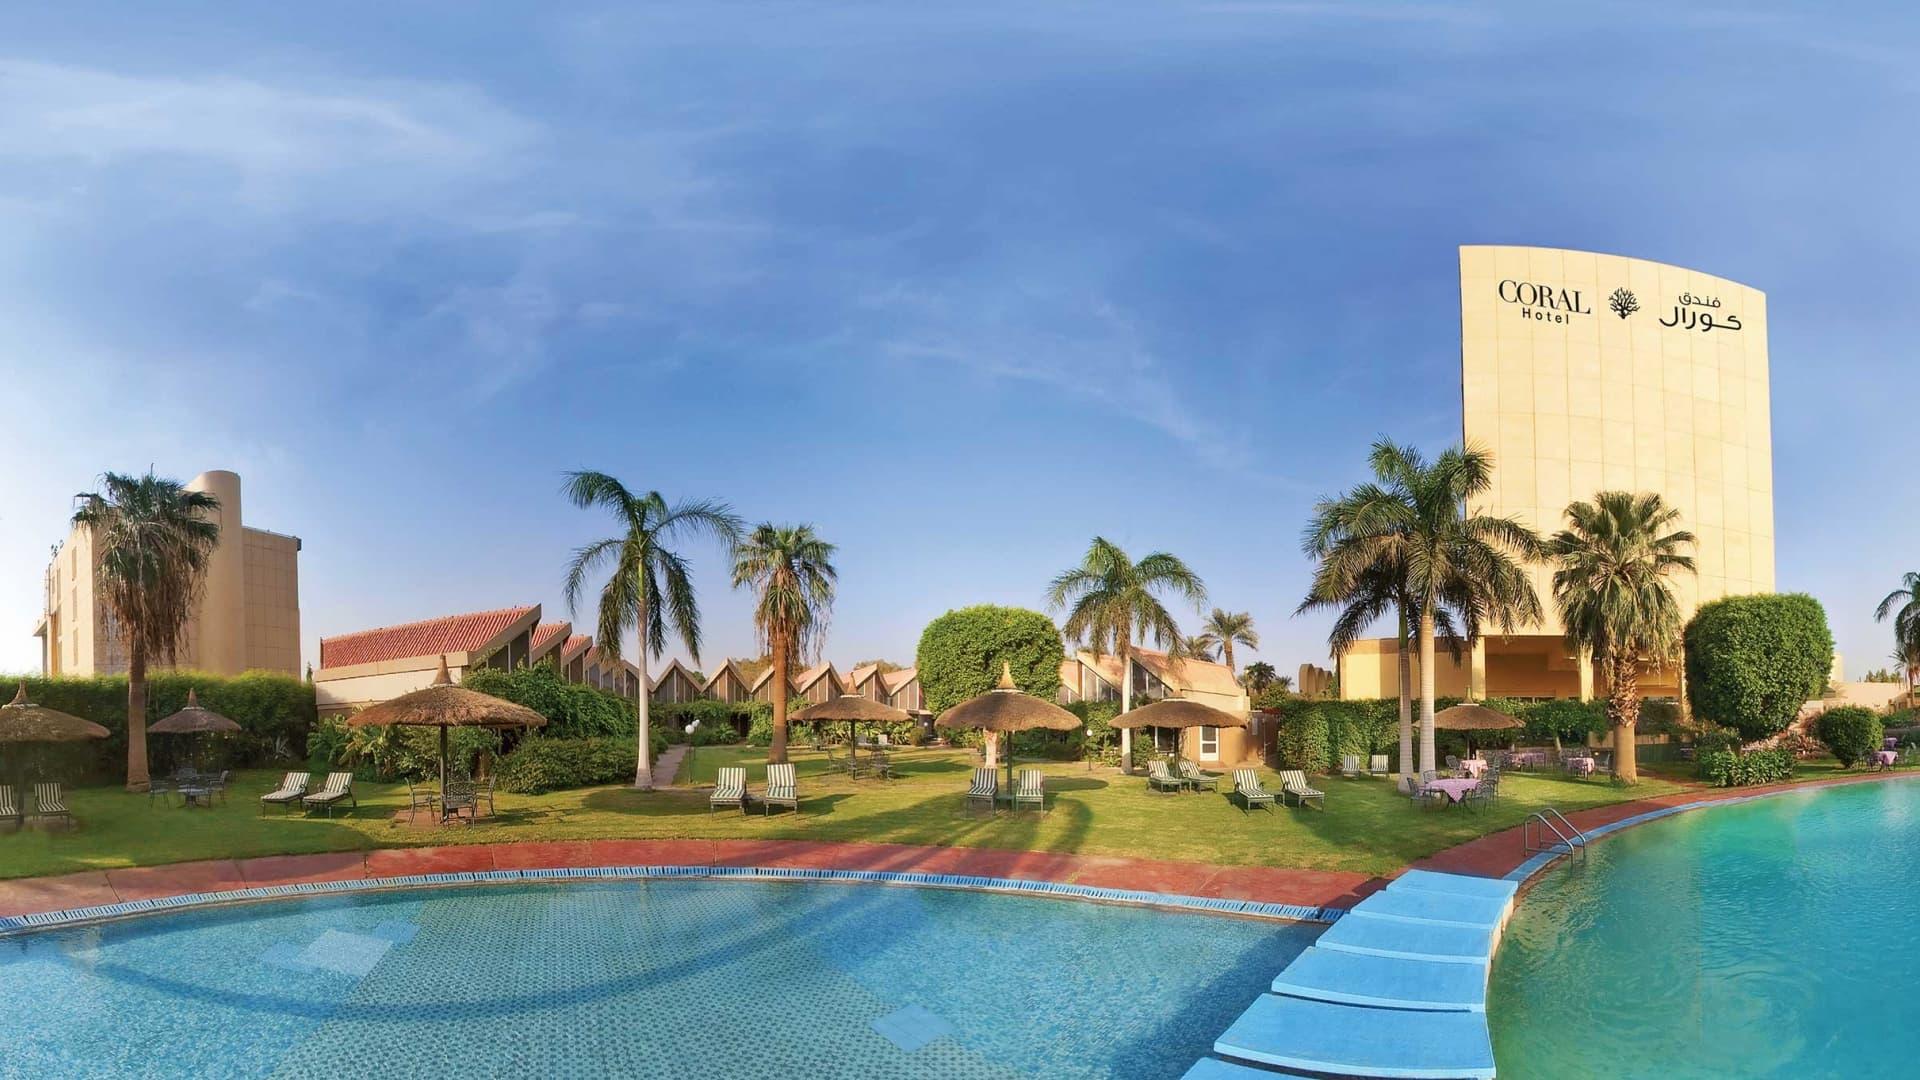 Coral Hotel Khartoum